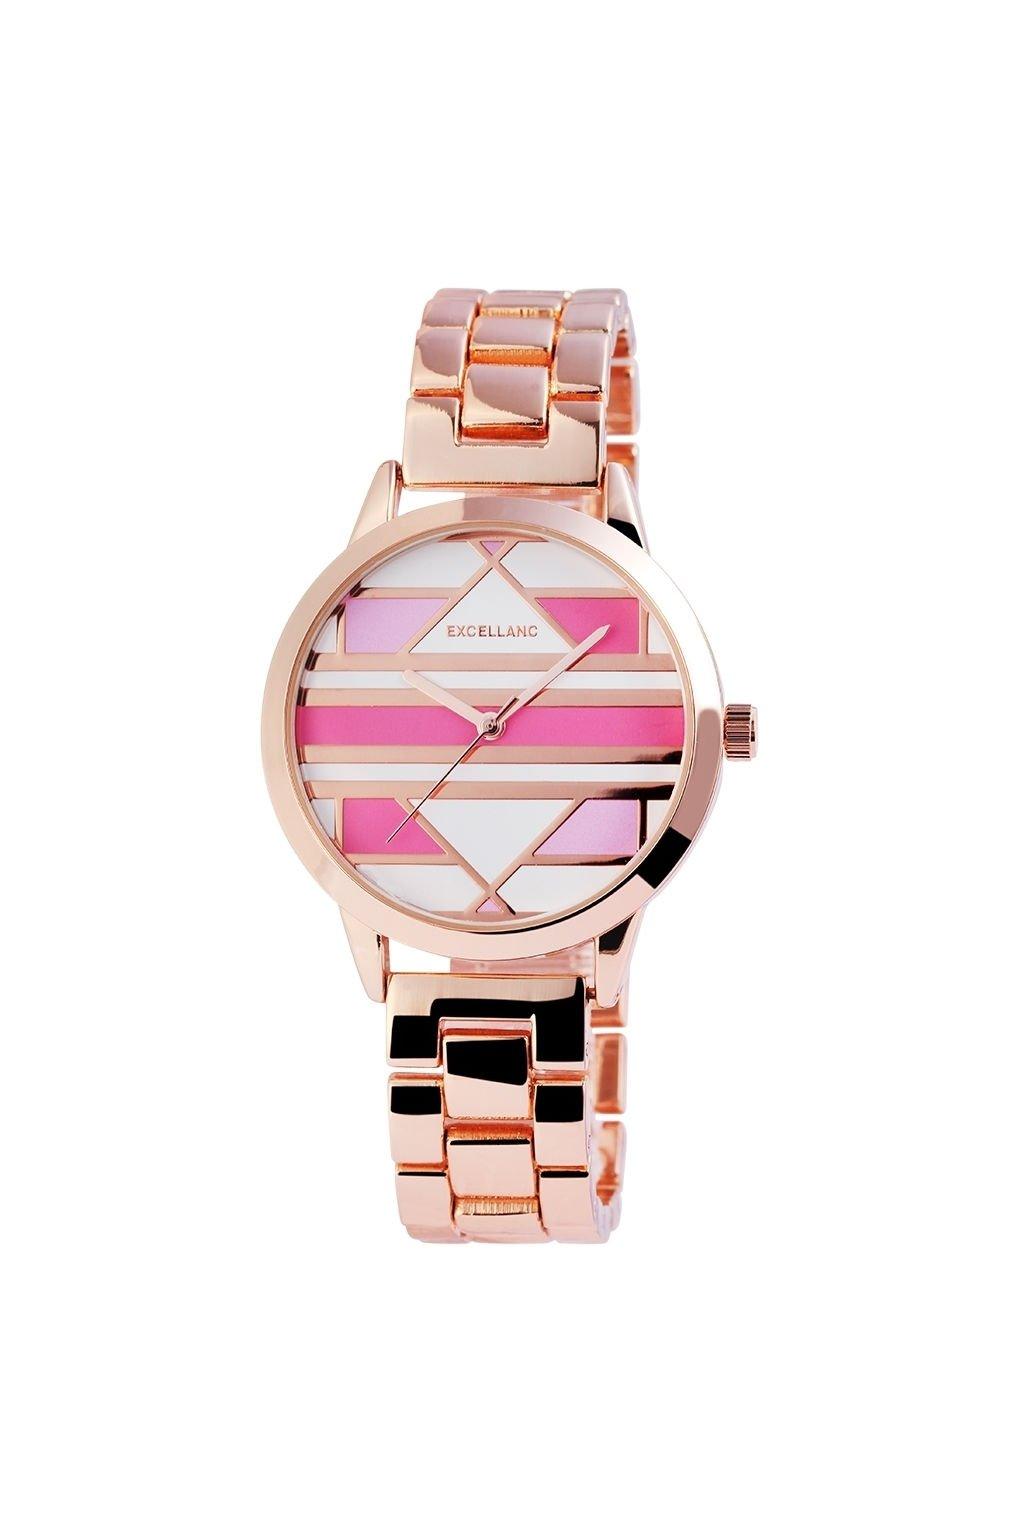 Kovové dámské hodinky s barevným ciferníkem